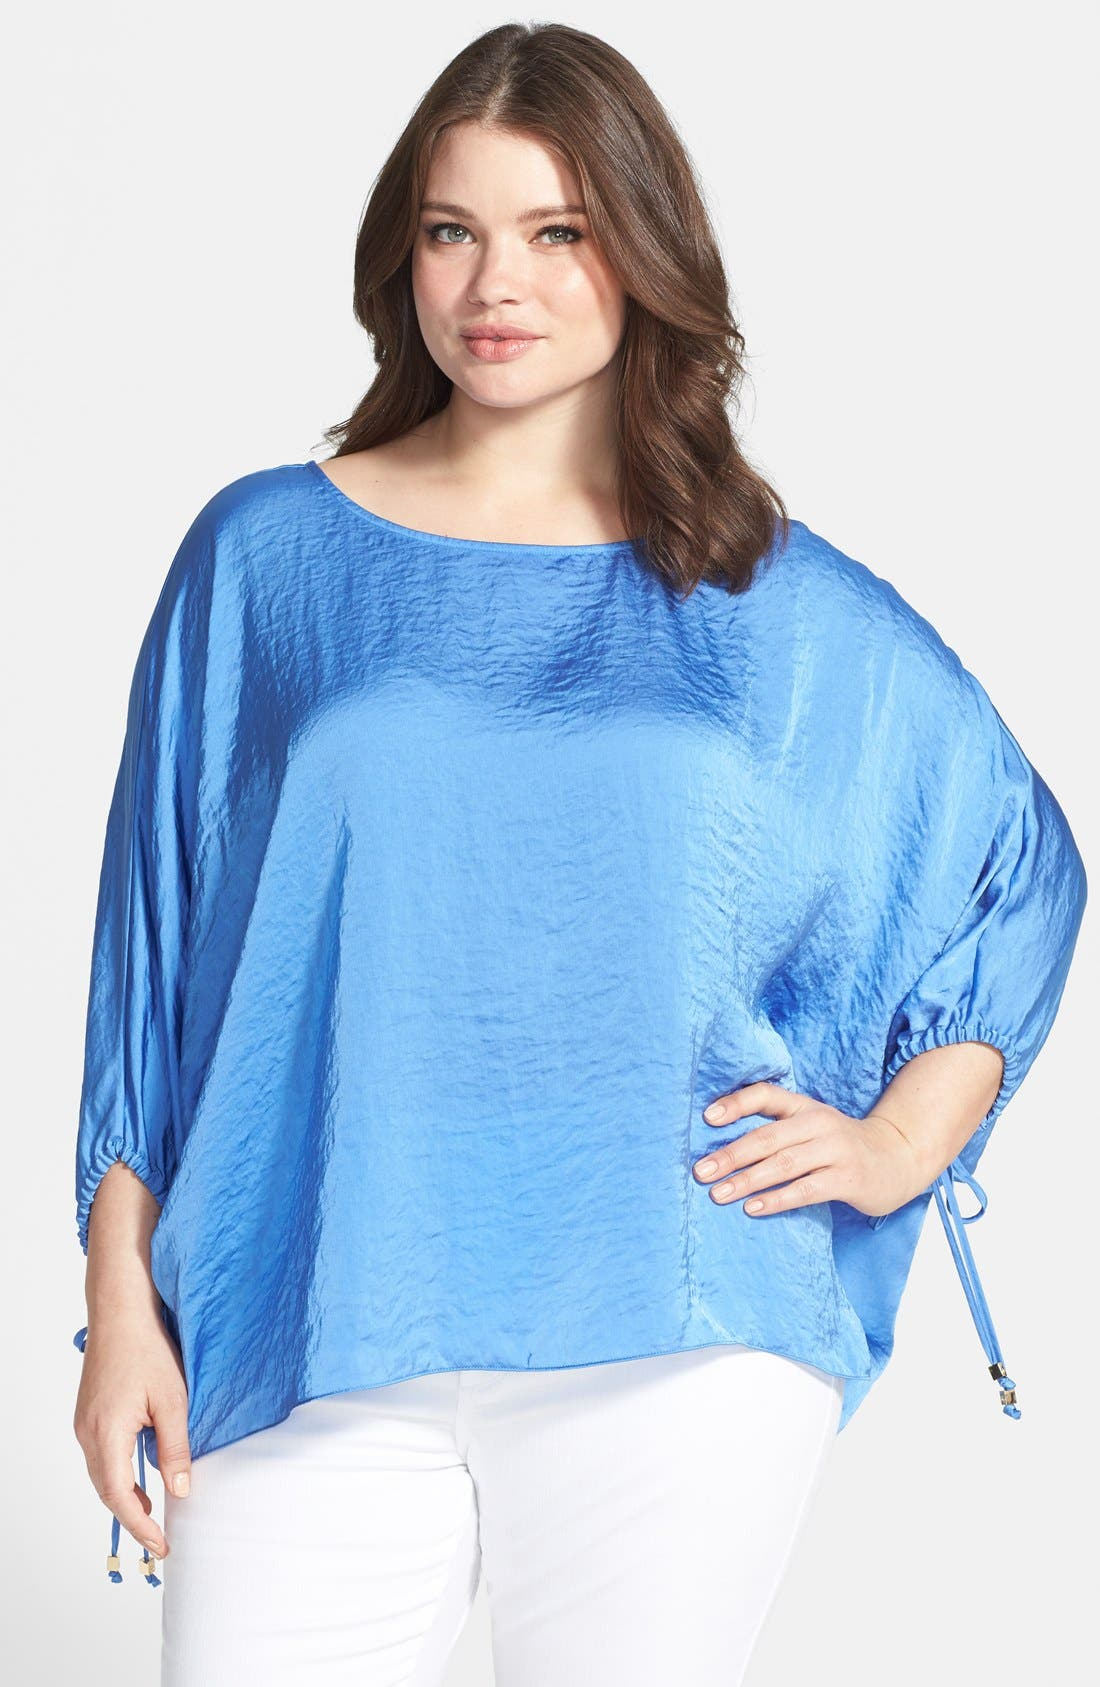 Alternate Image 1 Selected - MICHAEL Michael Kors Crushed Woven Kimono Top (Plus Size)